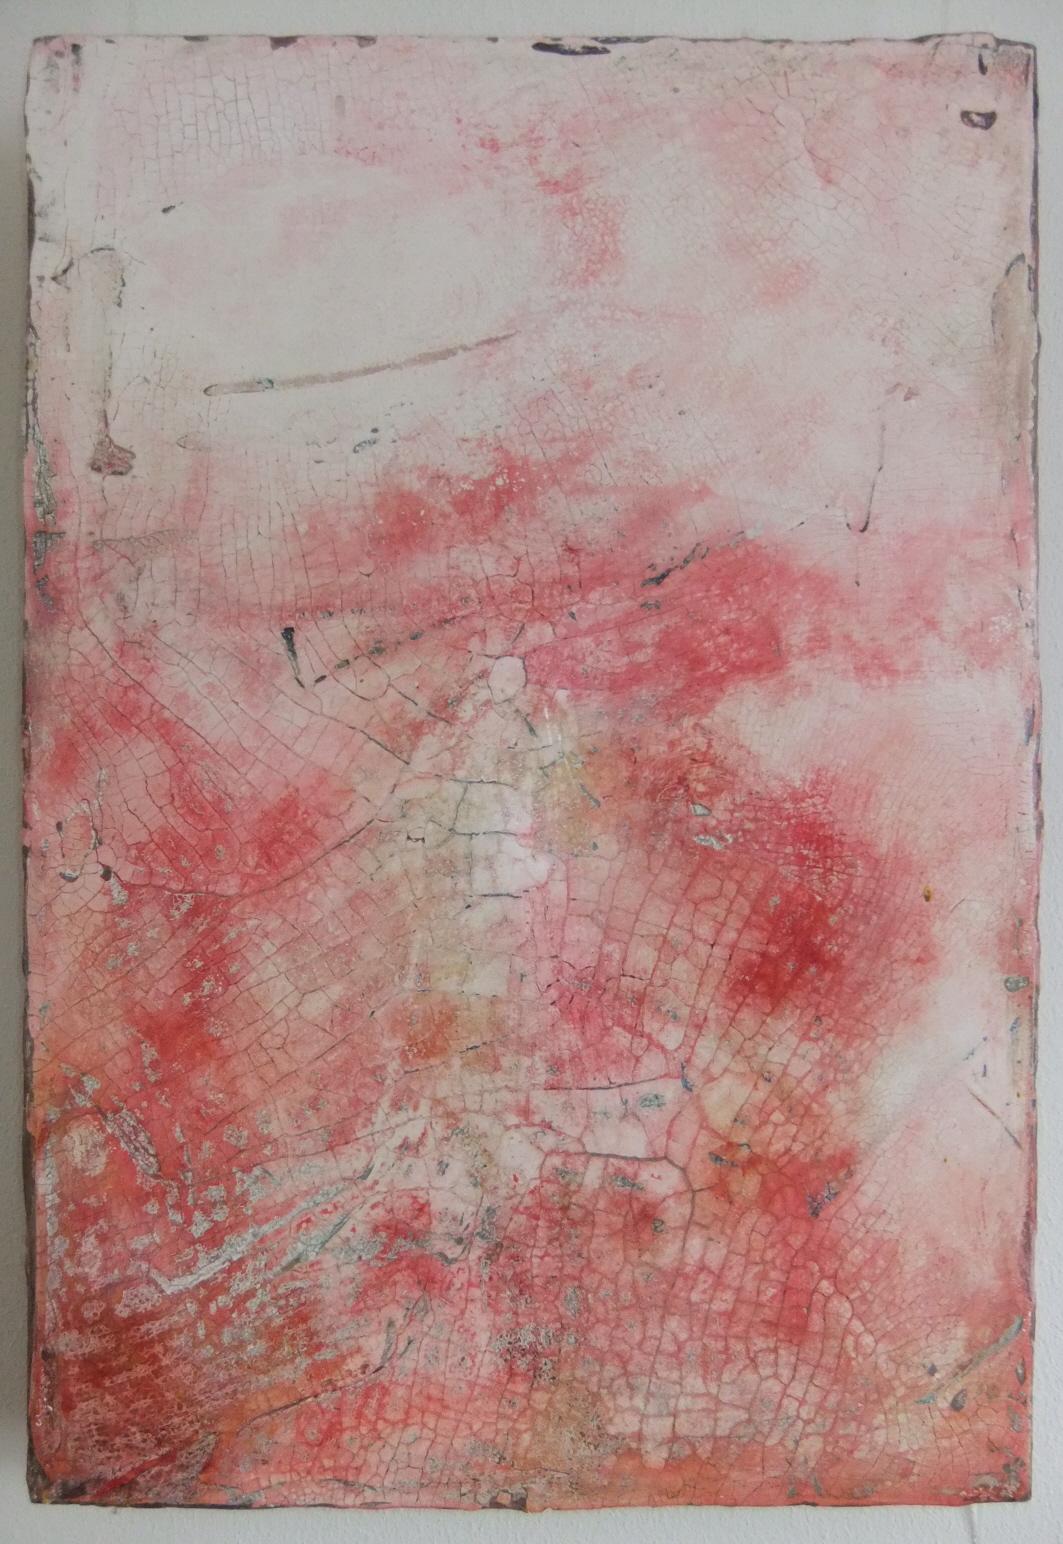 Werknr. SK_108 |O.T| Intonaco, Öl, Wachs auf Holz | 40 x 60 cm |2011